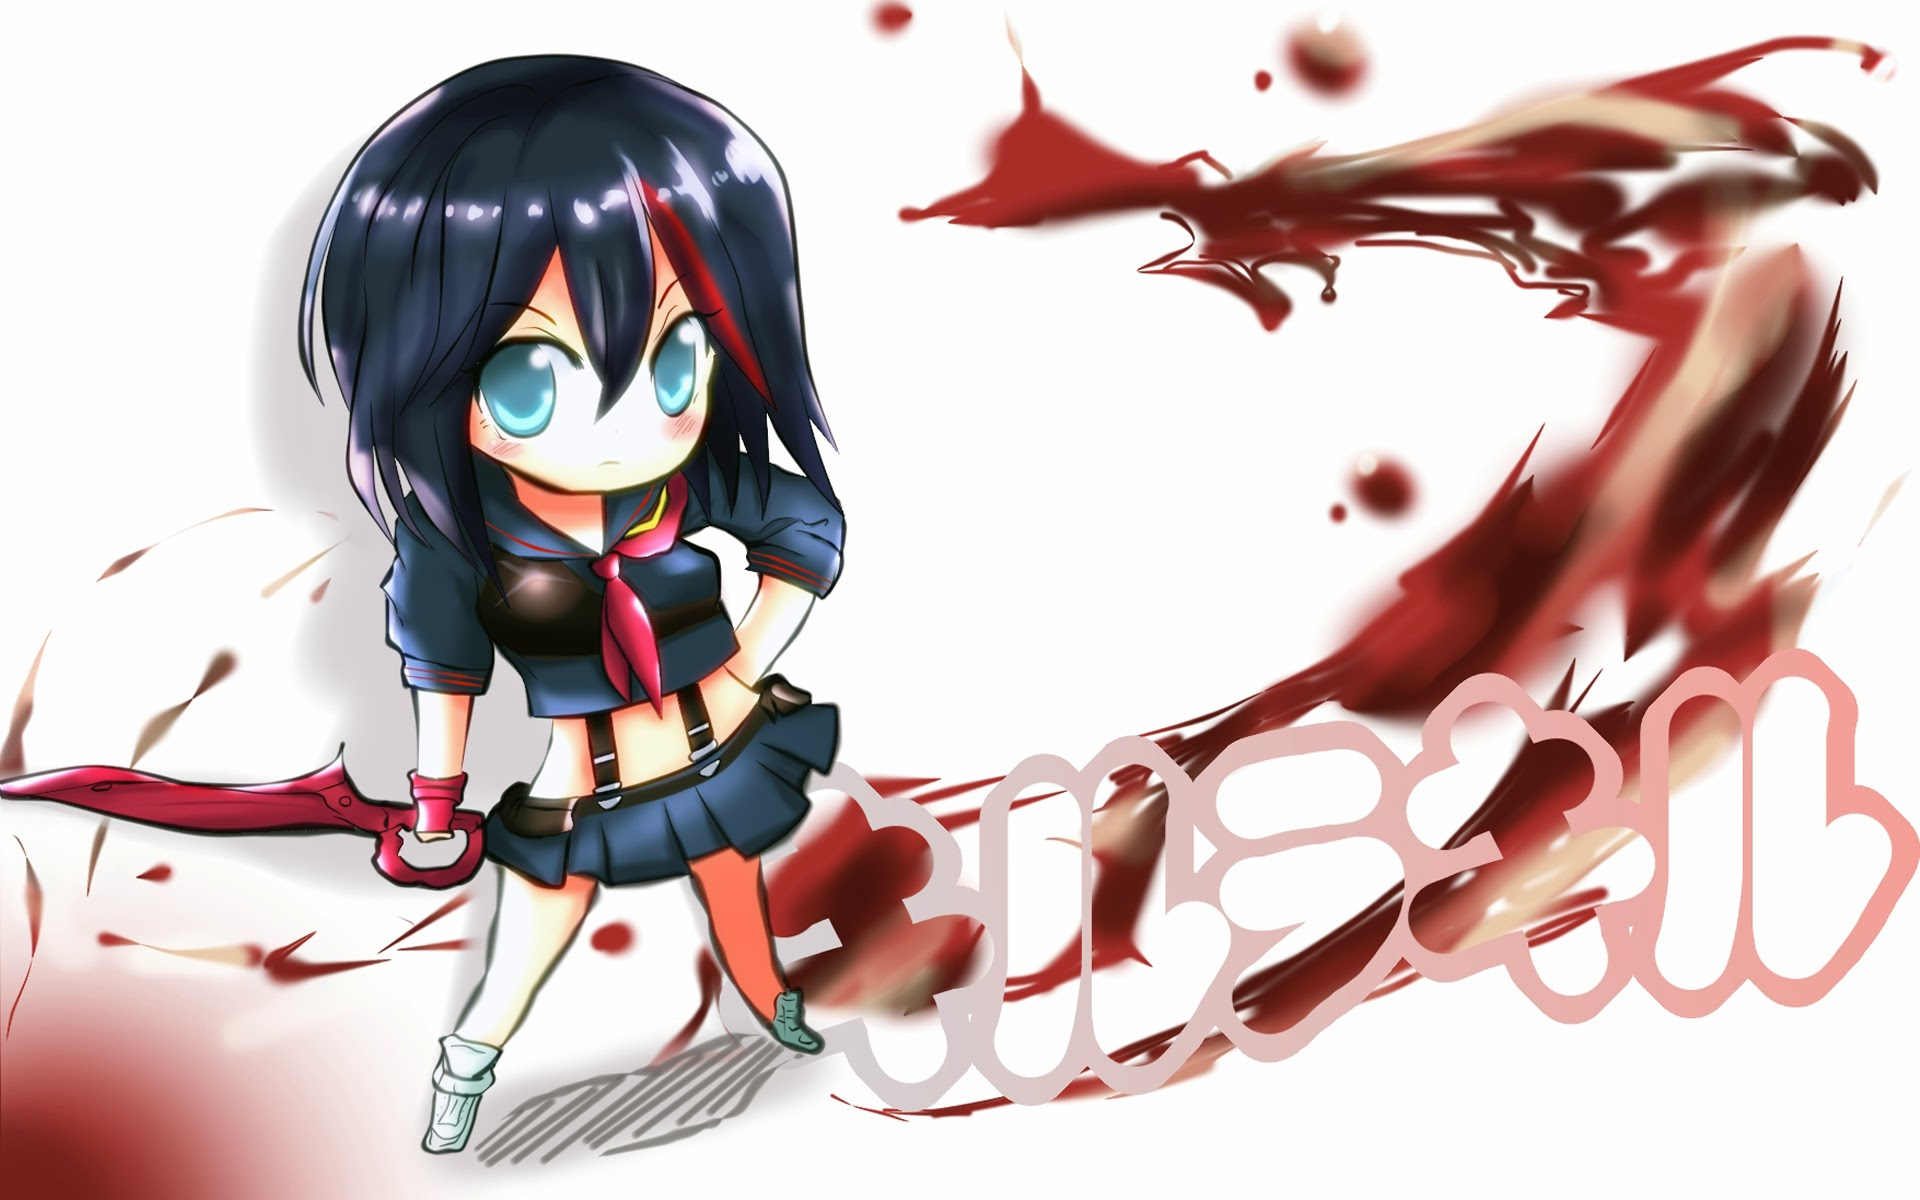 ryuko chibi kill la kill anime girl image hd wallpaper 1920x1200 4q 1920x1200